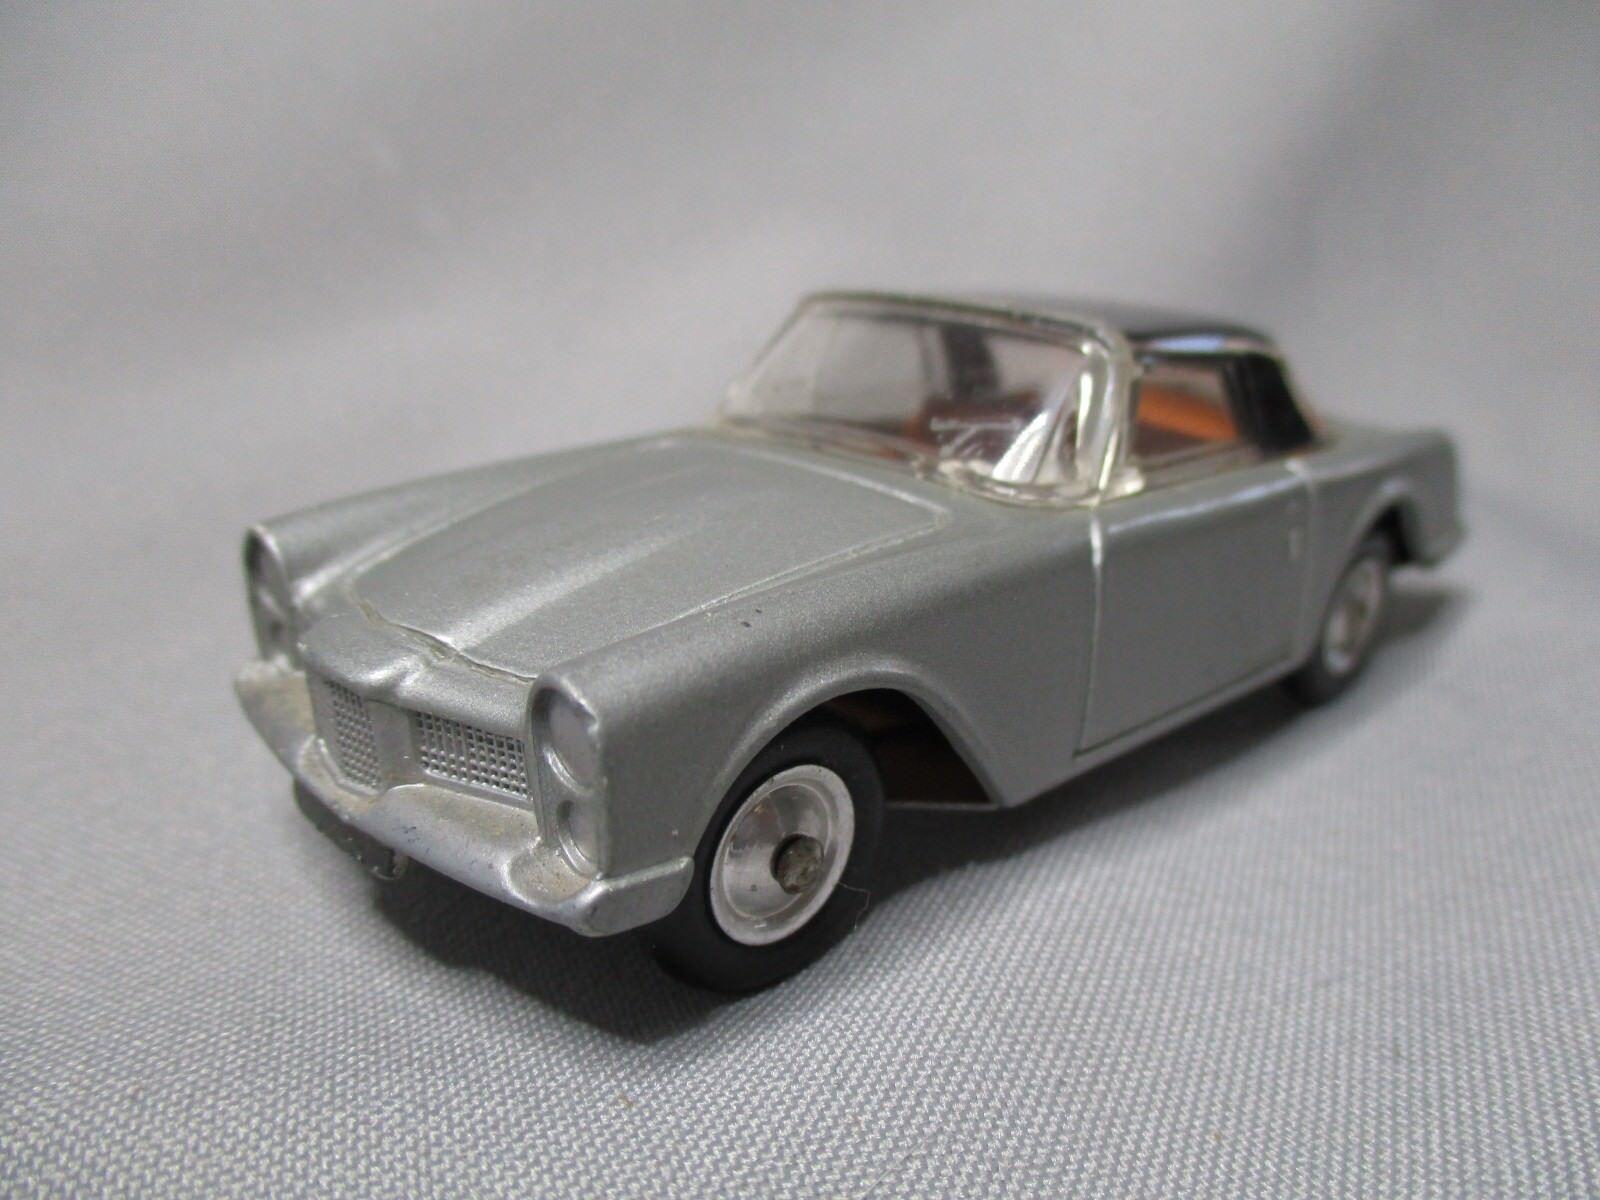 Ah228 cij europarc 1 43 facel vega facellia 1960 cabriolet ref 3.3